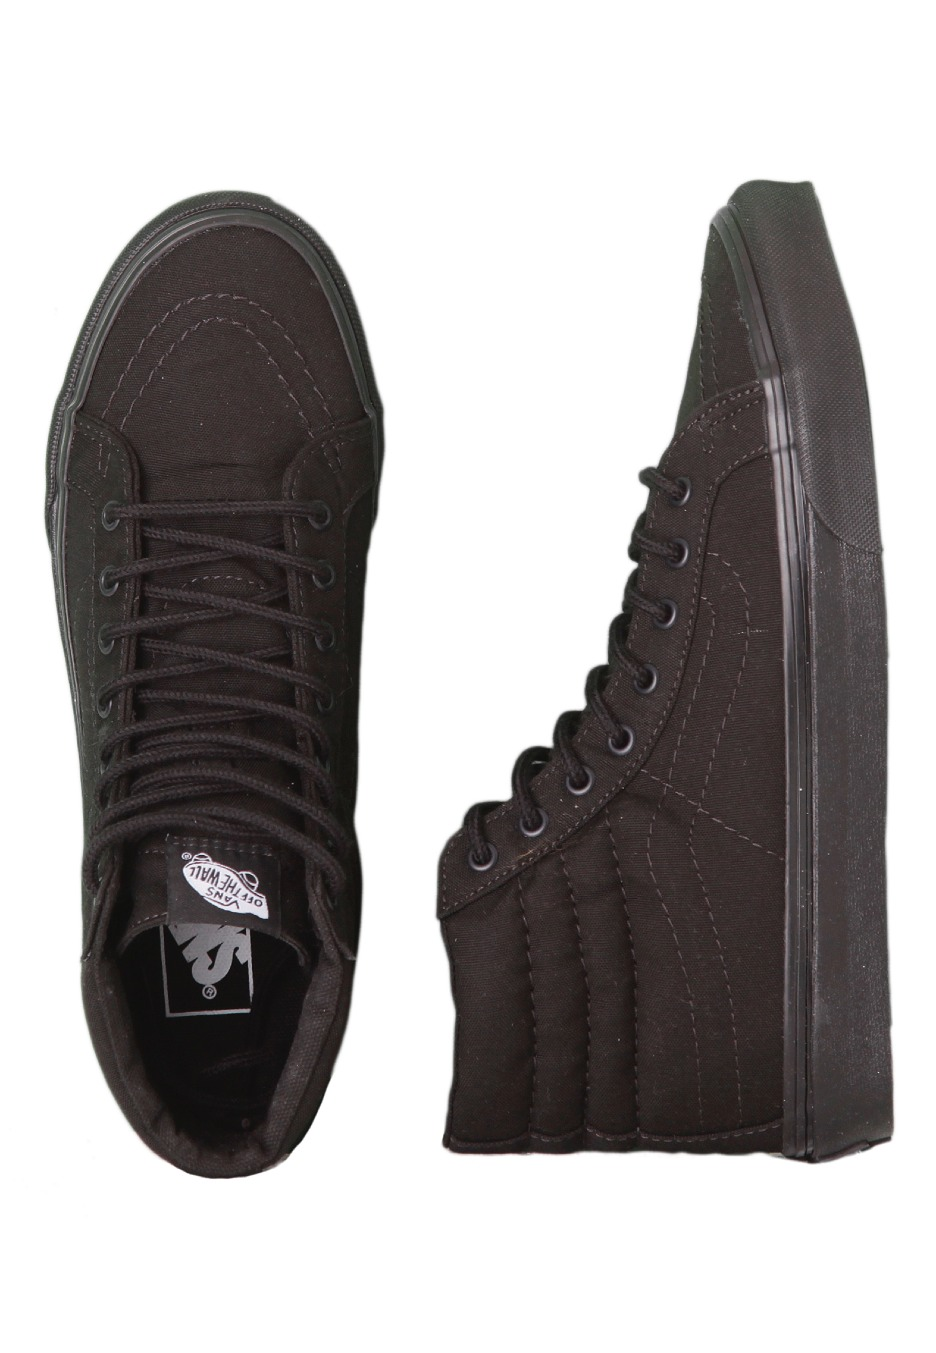 6423c23cd3 Vans - SK8-Hi Slim Black Black - Girl Shoes - Impericon.com UK